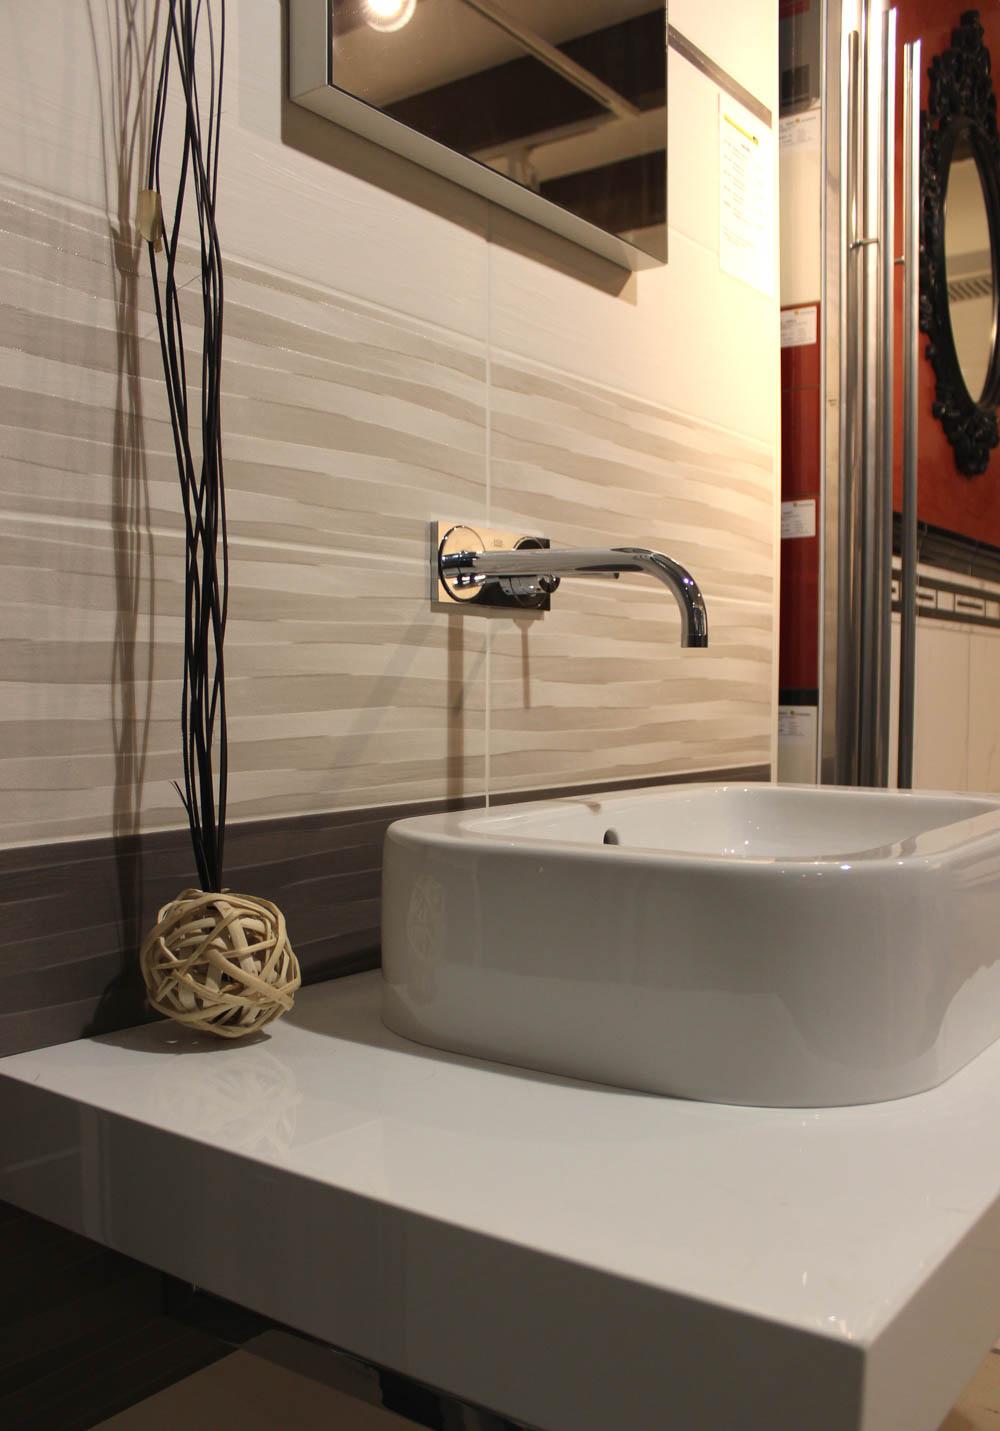 berlin spandau linnenbecker gmbh holzhandel fliesenhandel baustoffhandel. Black Bedroom Furniture Sets. Home Design Ideas